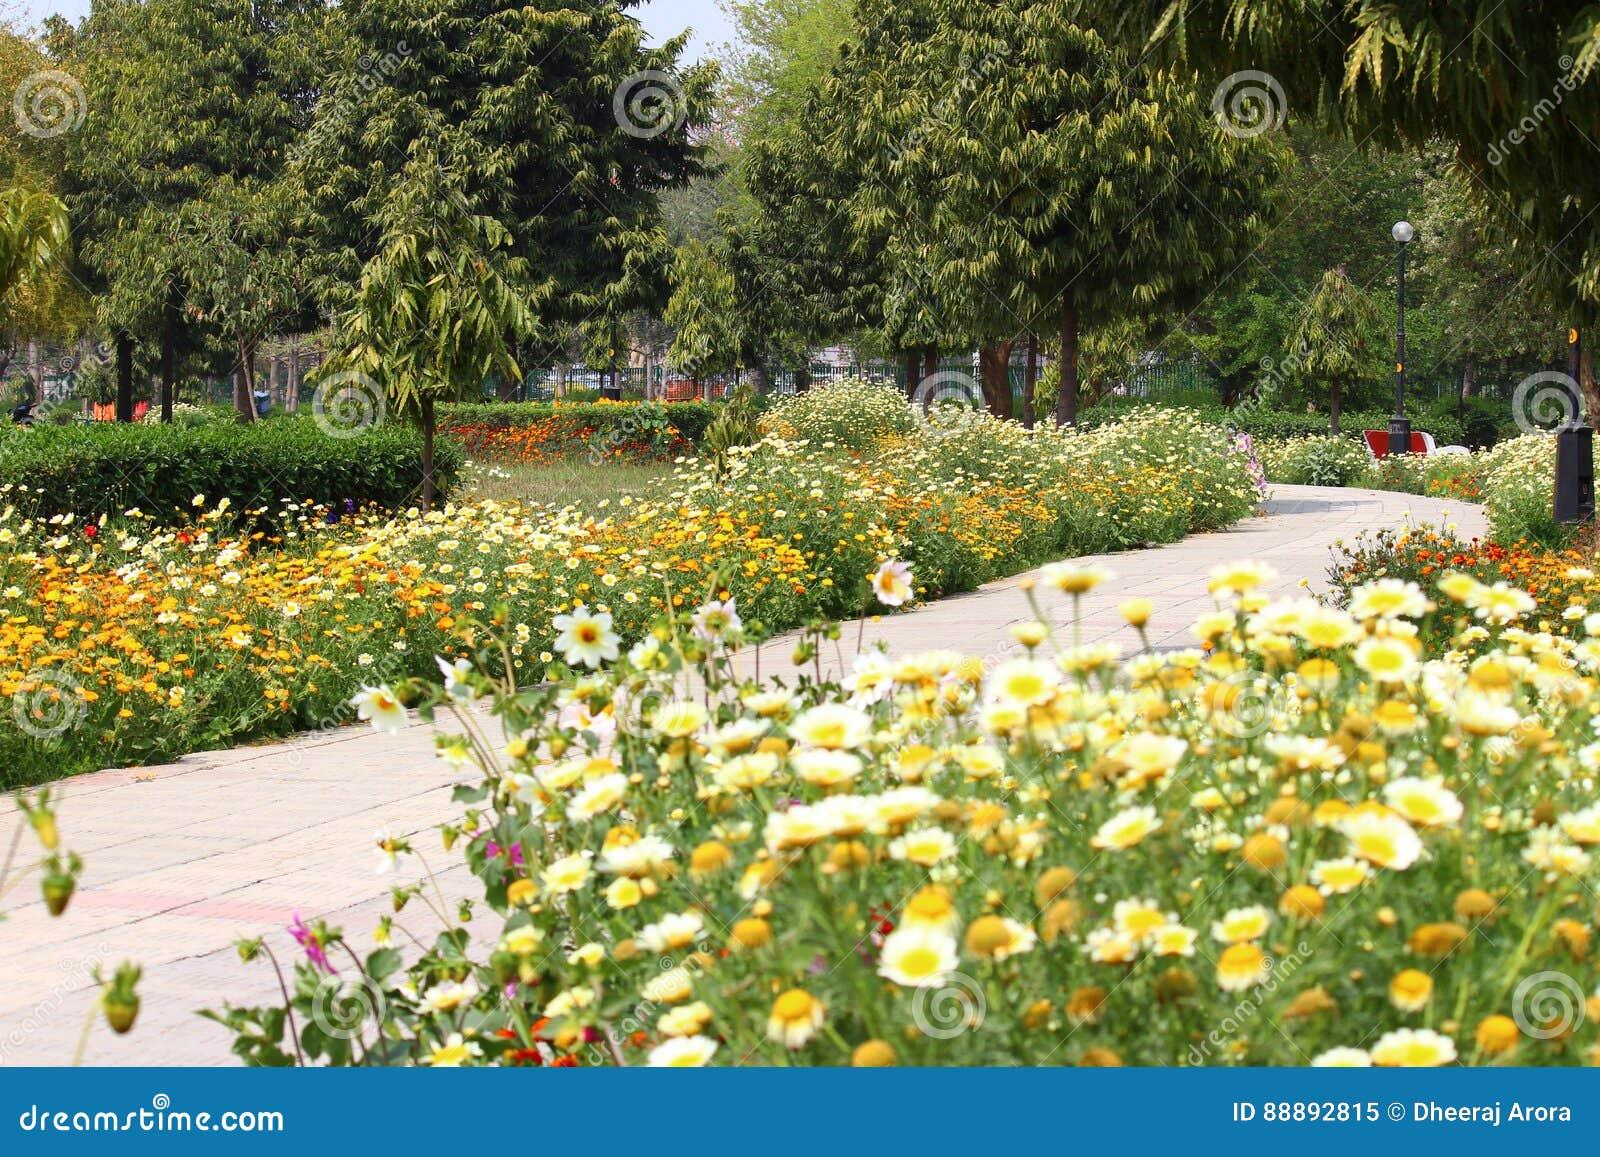 Swarn Jayanti Park Rohini New Delhi India Stock Image Image Of